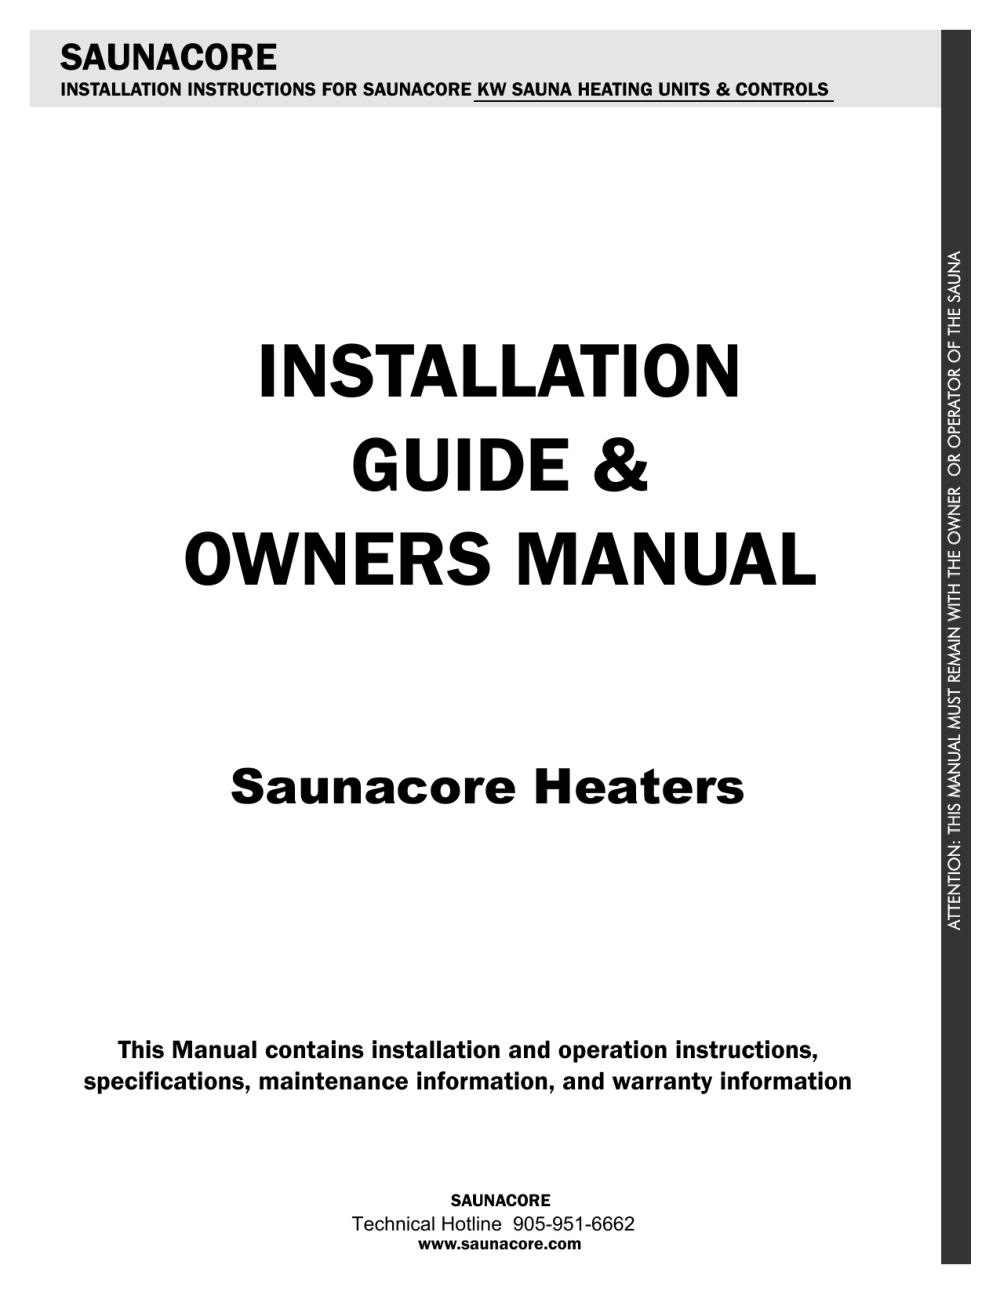 medium resolution of saunacore sauna heater manual